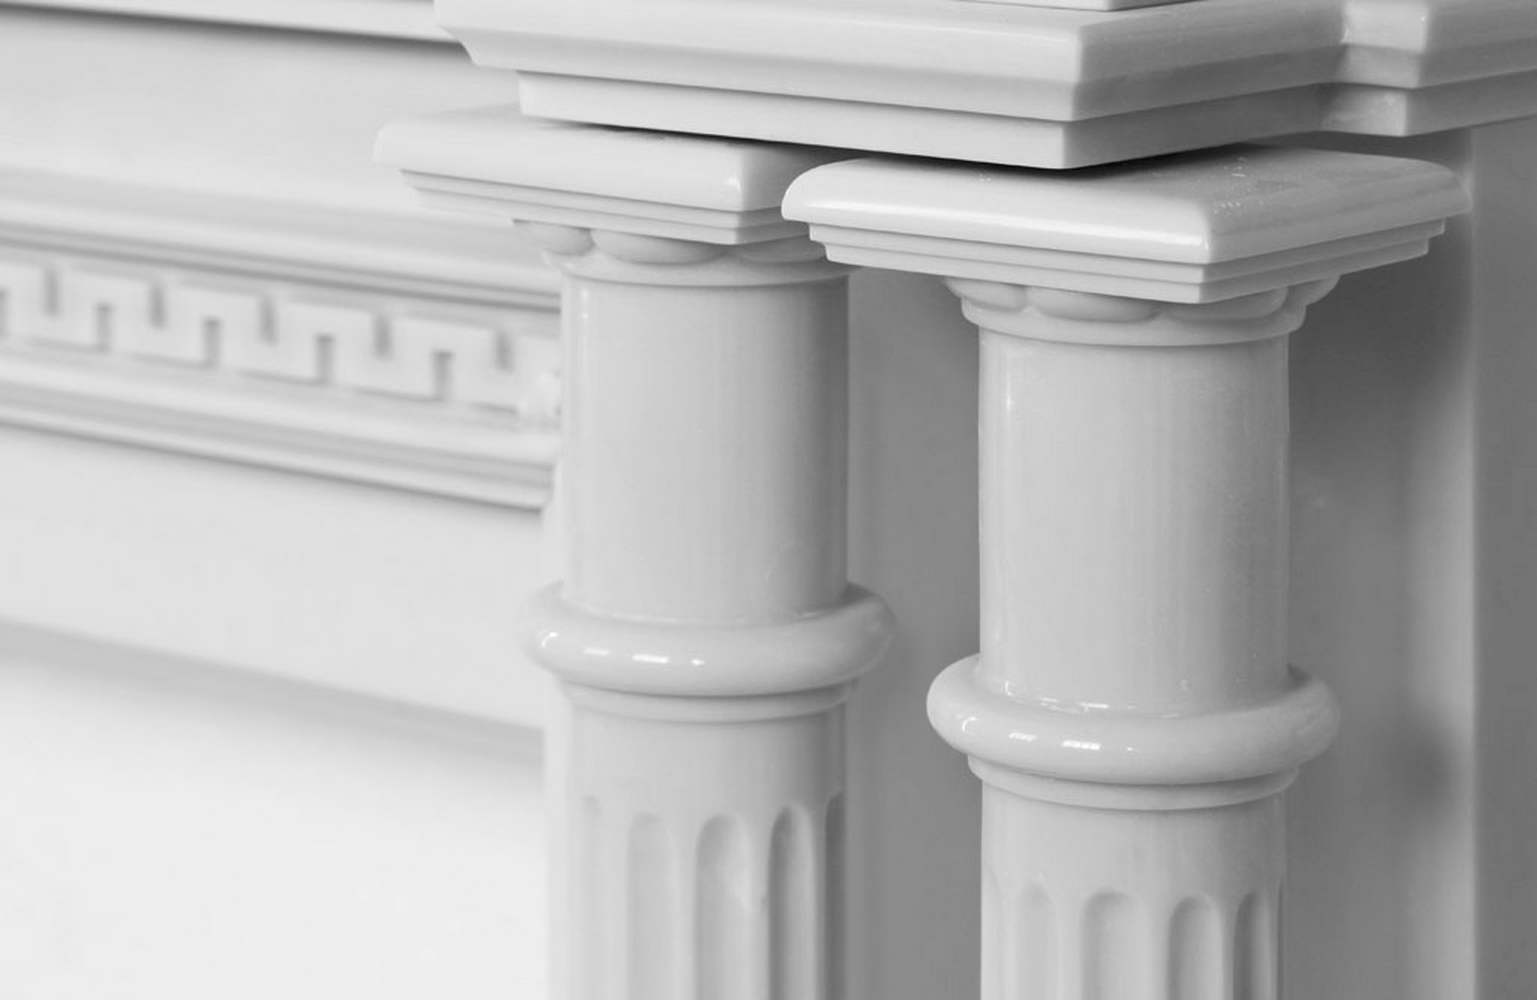 Camino in Marmo Bianco, colonne in marmo